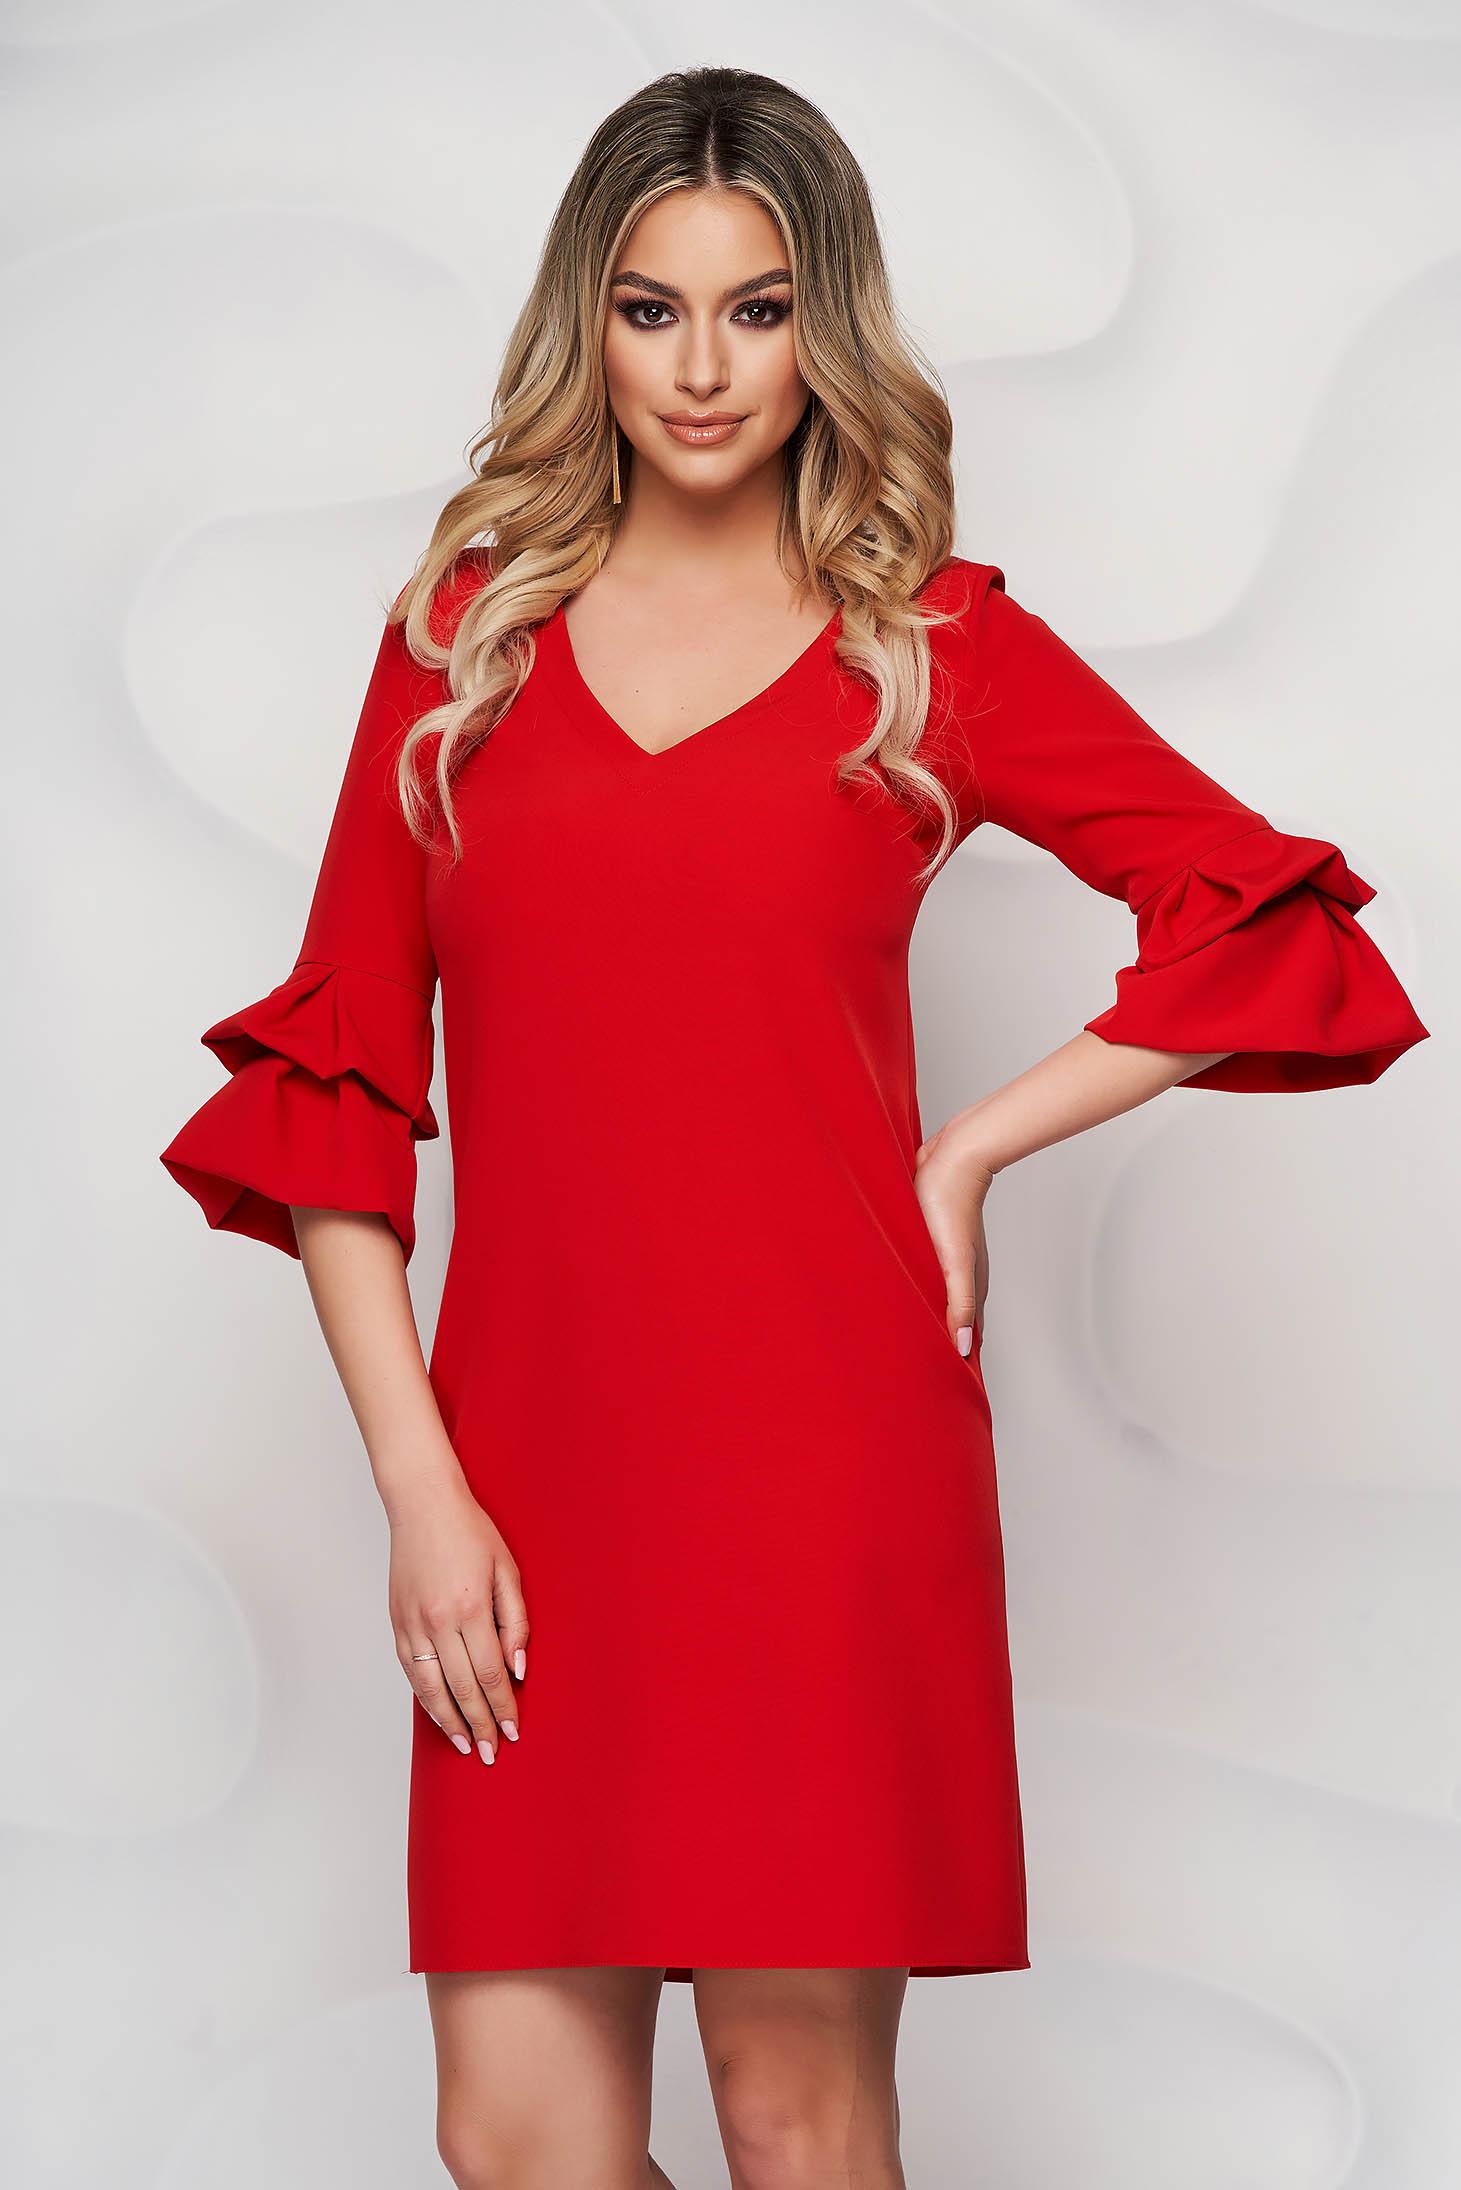 Rochie StarShinerS rosie office cu croi larg din stofa subtire usor elastica cu maneci incretite